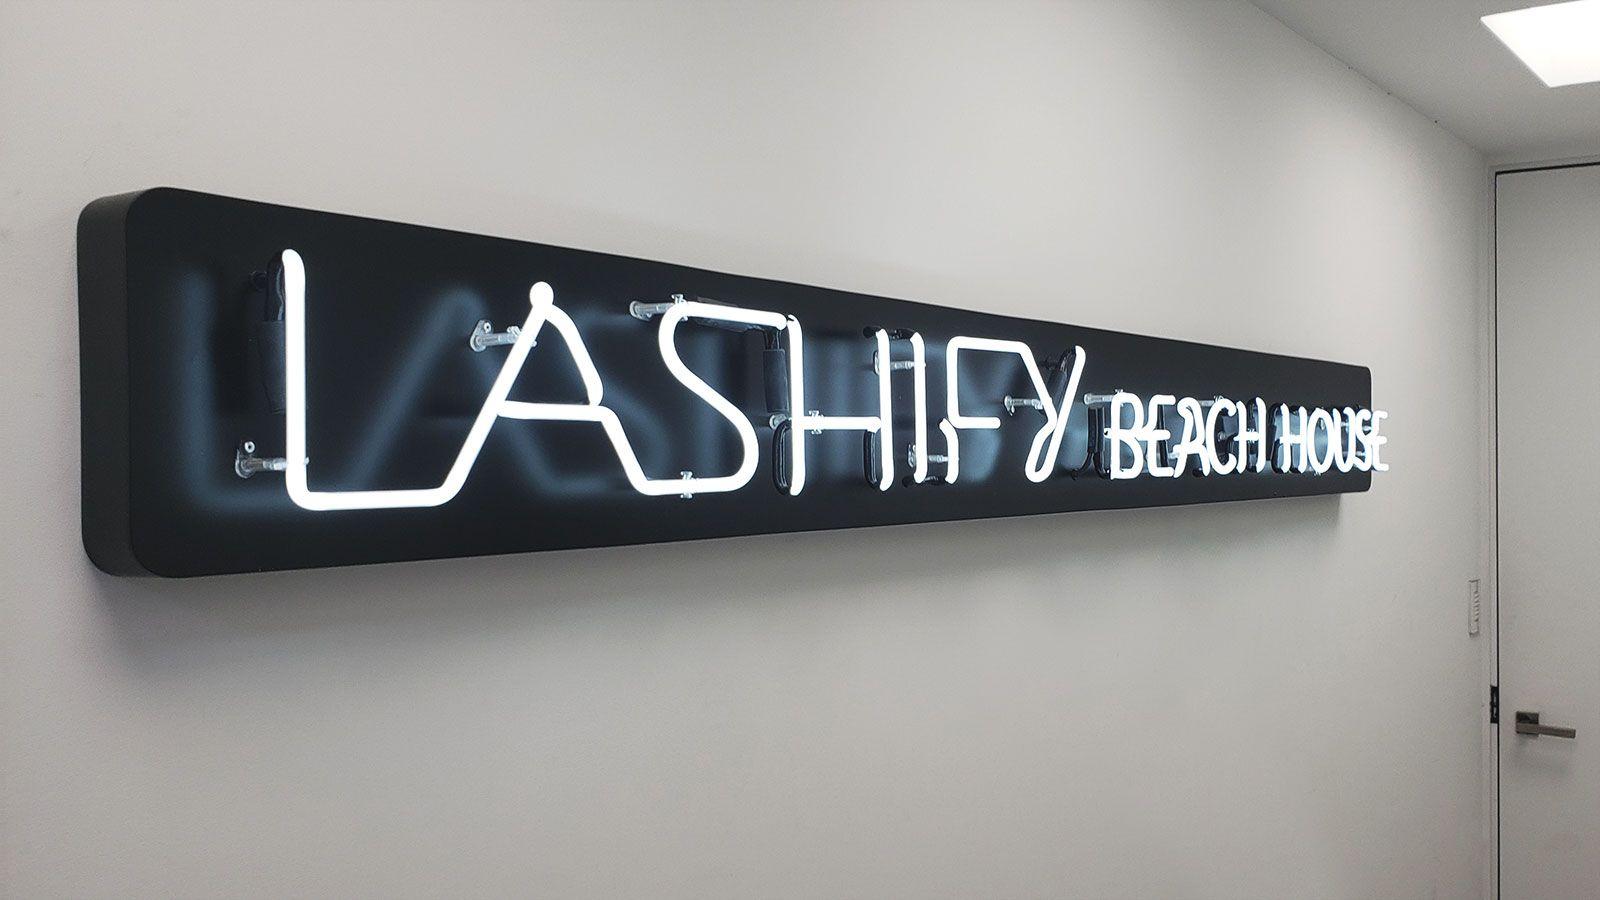 Lashify neon sign